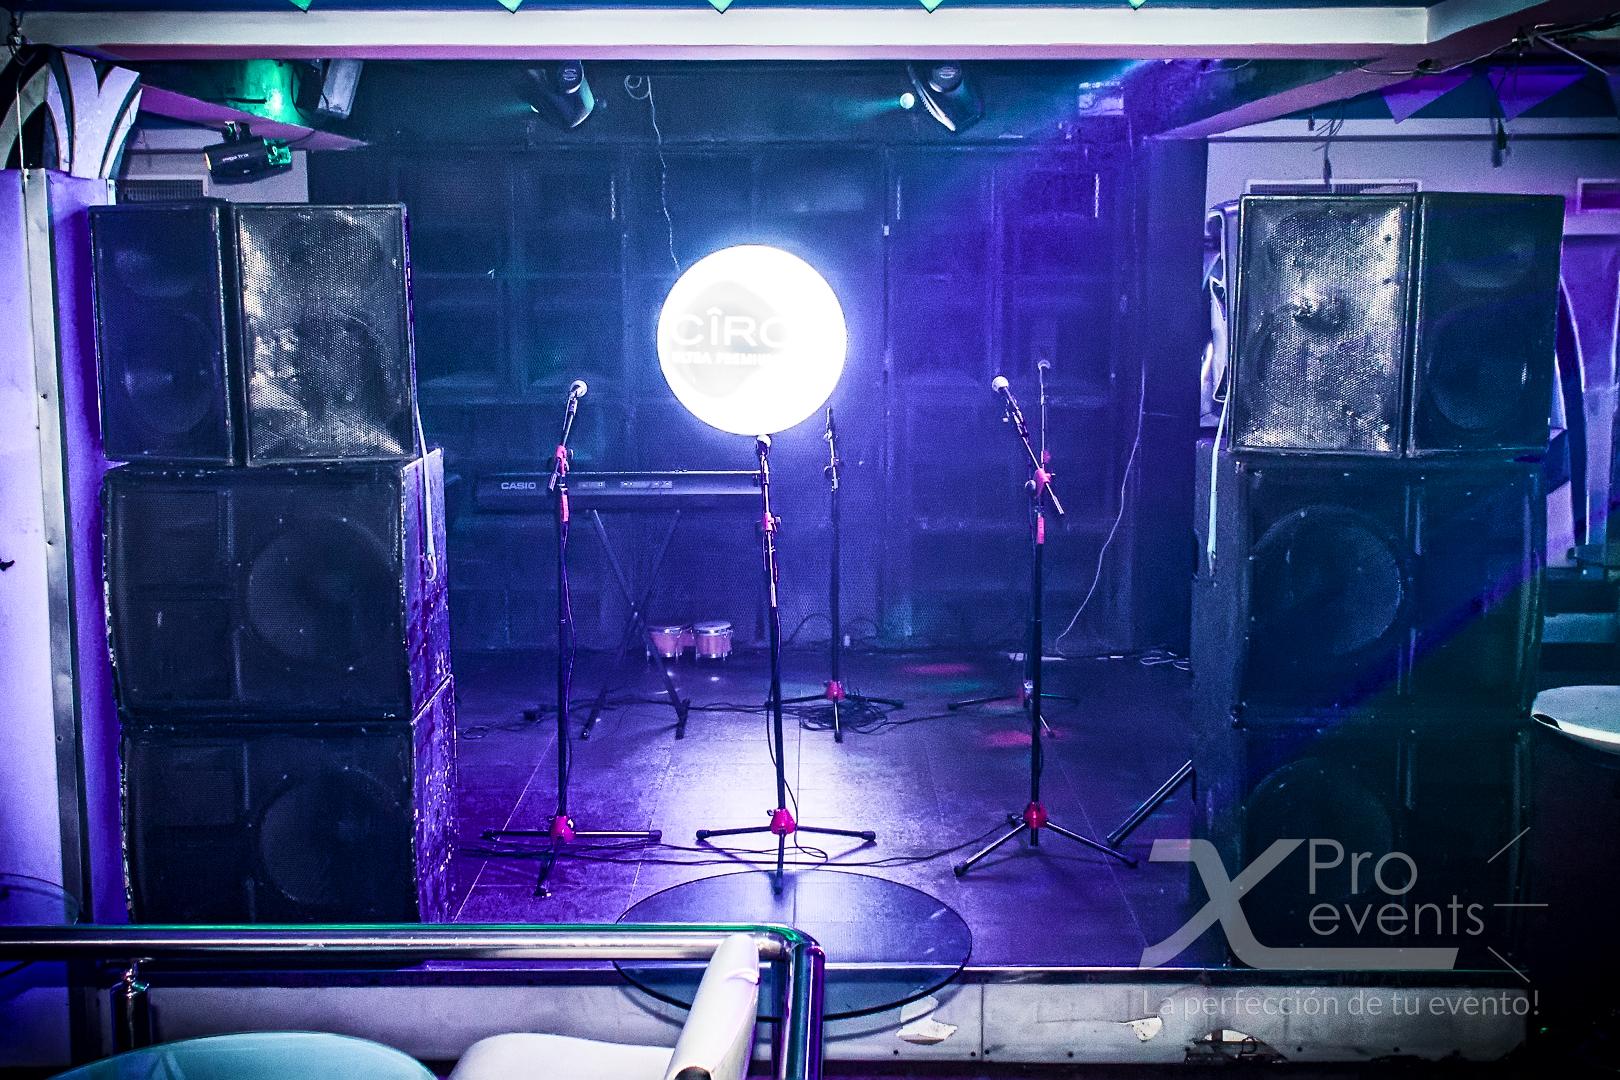 X Pro events - Sistema de sonido Yorkville(Makumba VIP).jpg